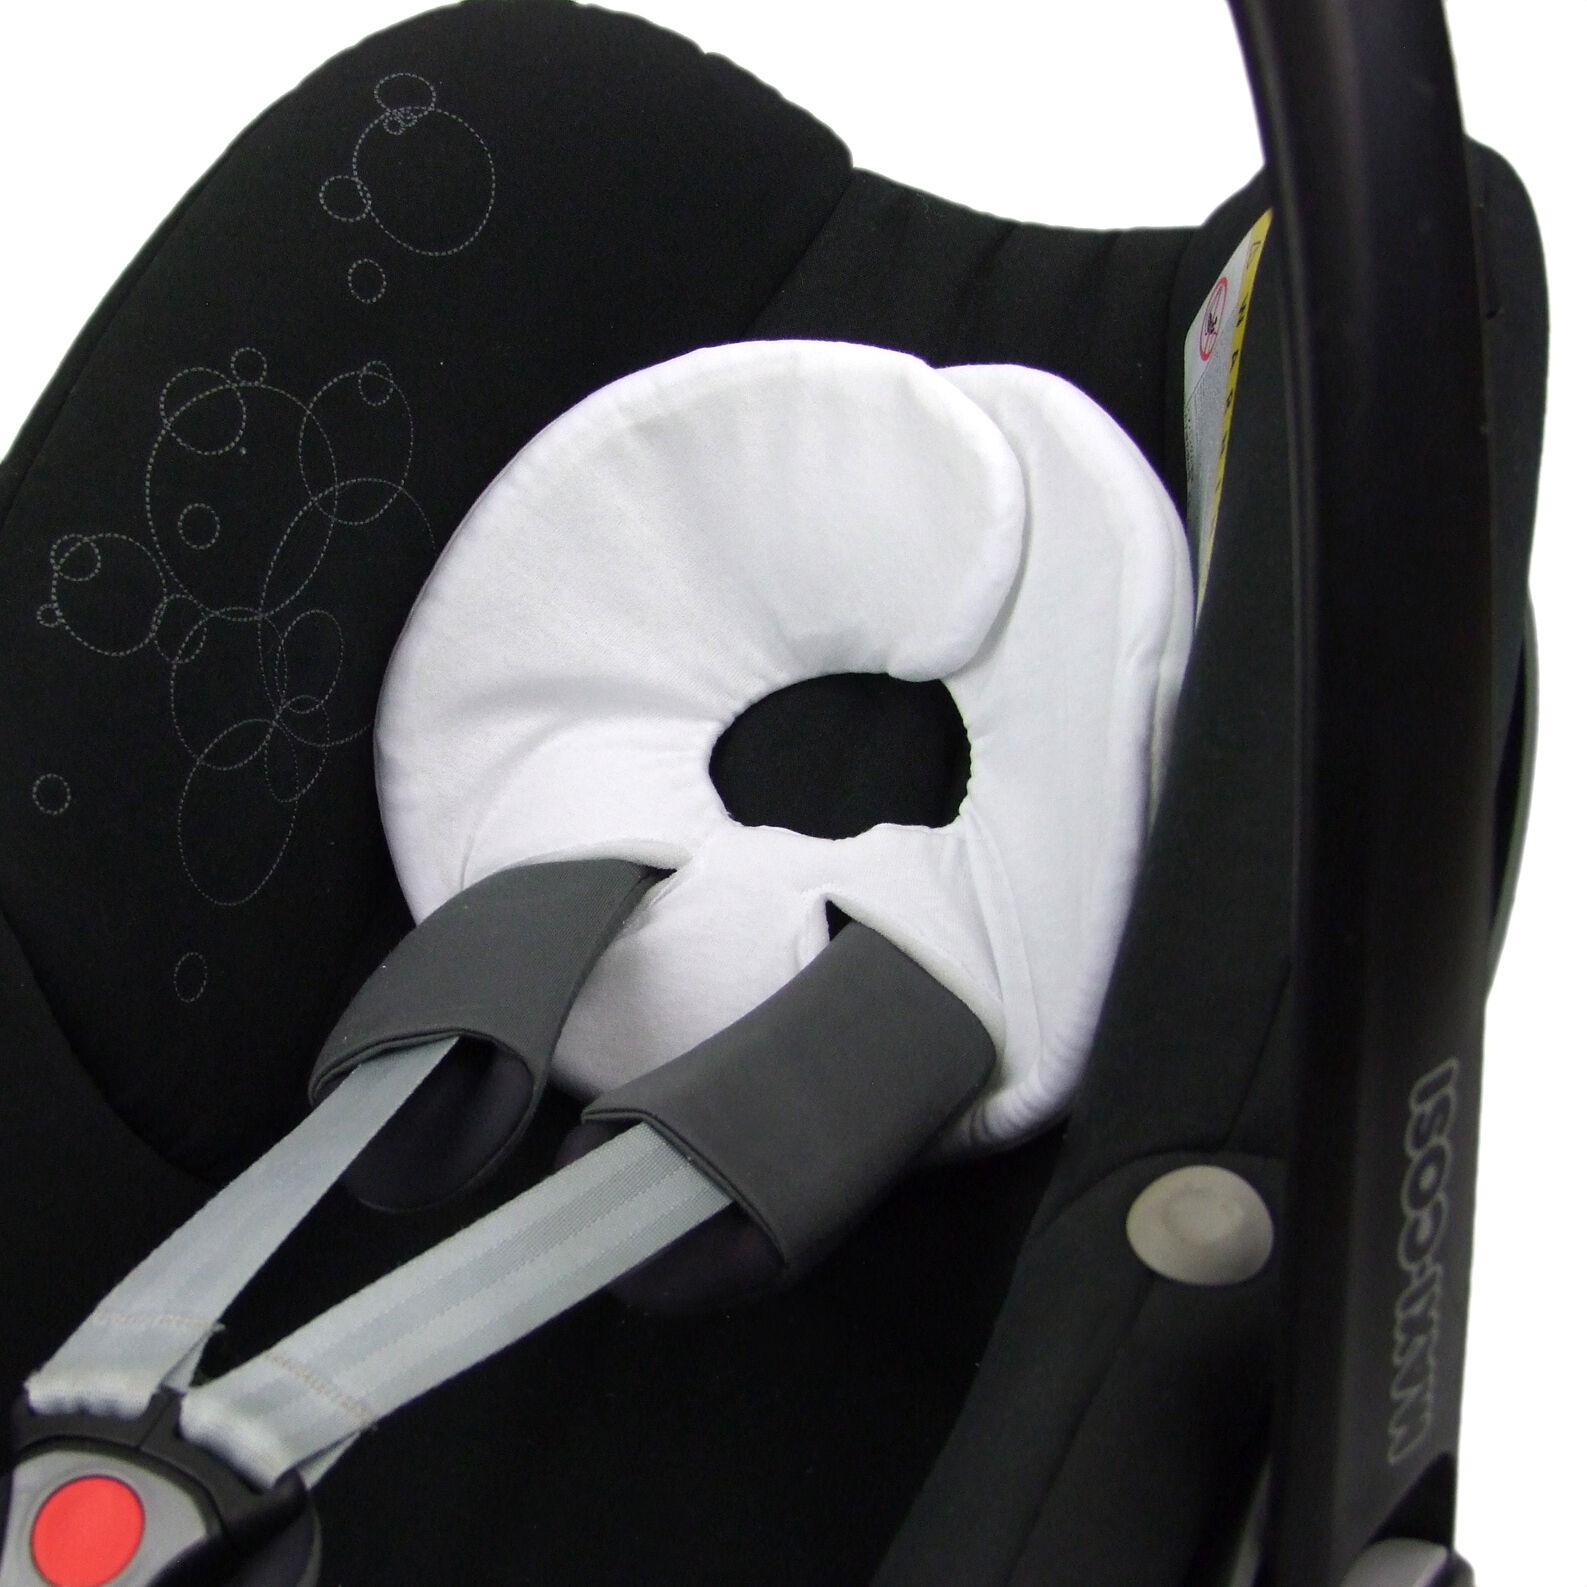 BAMBINIWELT Kopfstütze Kopfpolster für Babyschale MAXI-COSI Pebble, Pebble Plus 13. Baumwolle Weiß